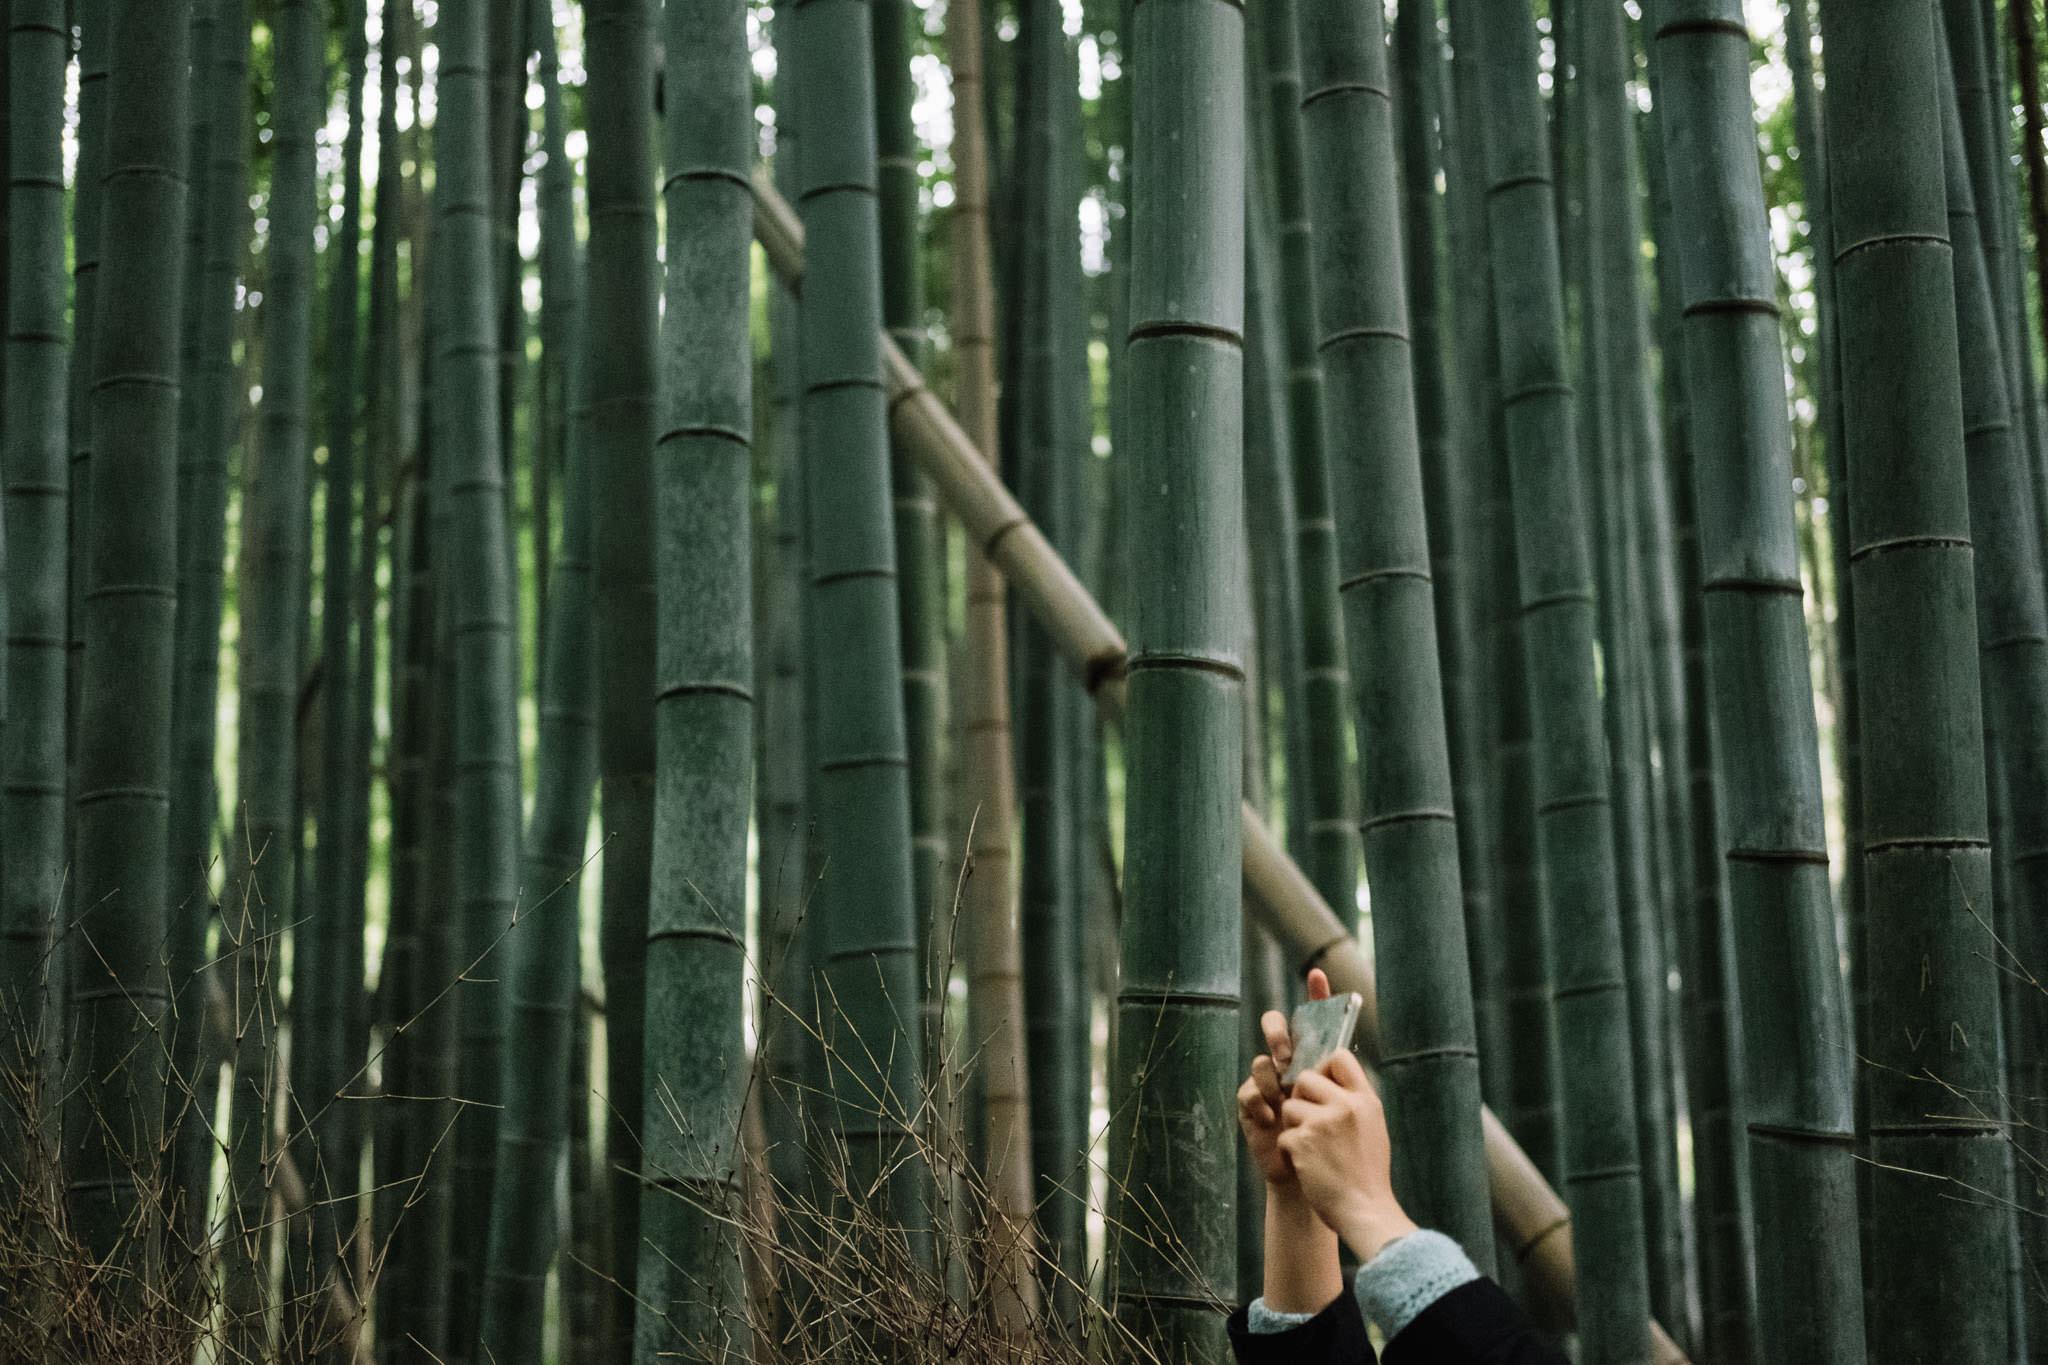 chris_eberhardt_japan_travel_reise_nippon-55.jpg